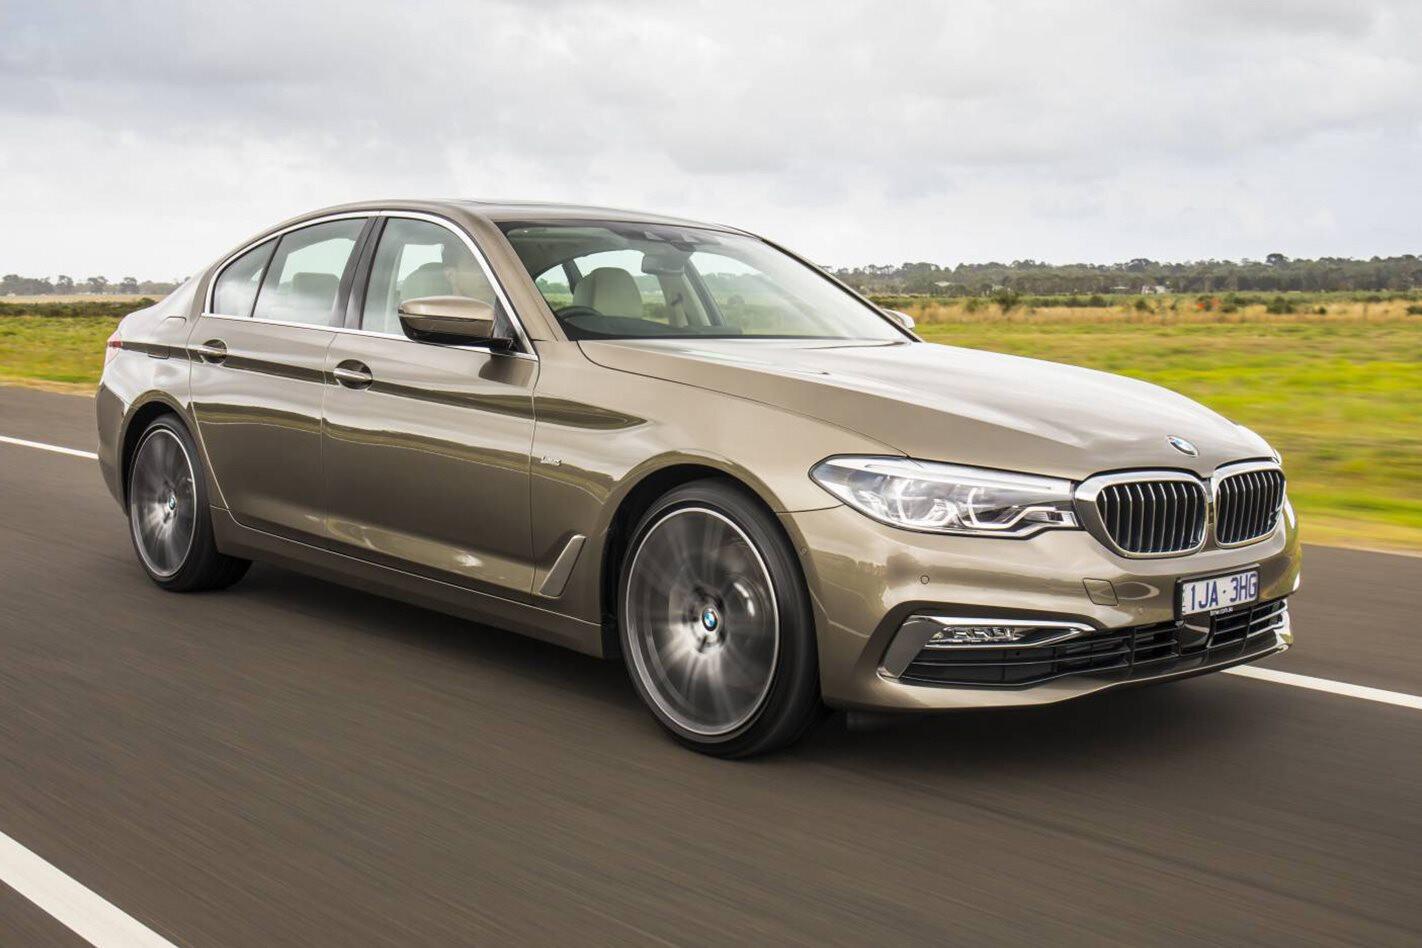 2017 BMW 530d quick review